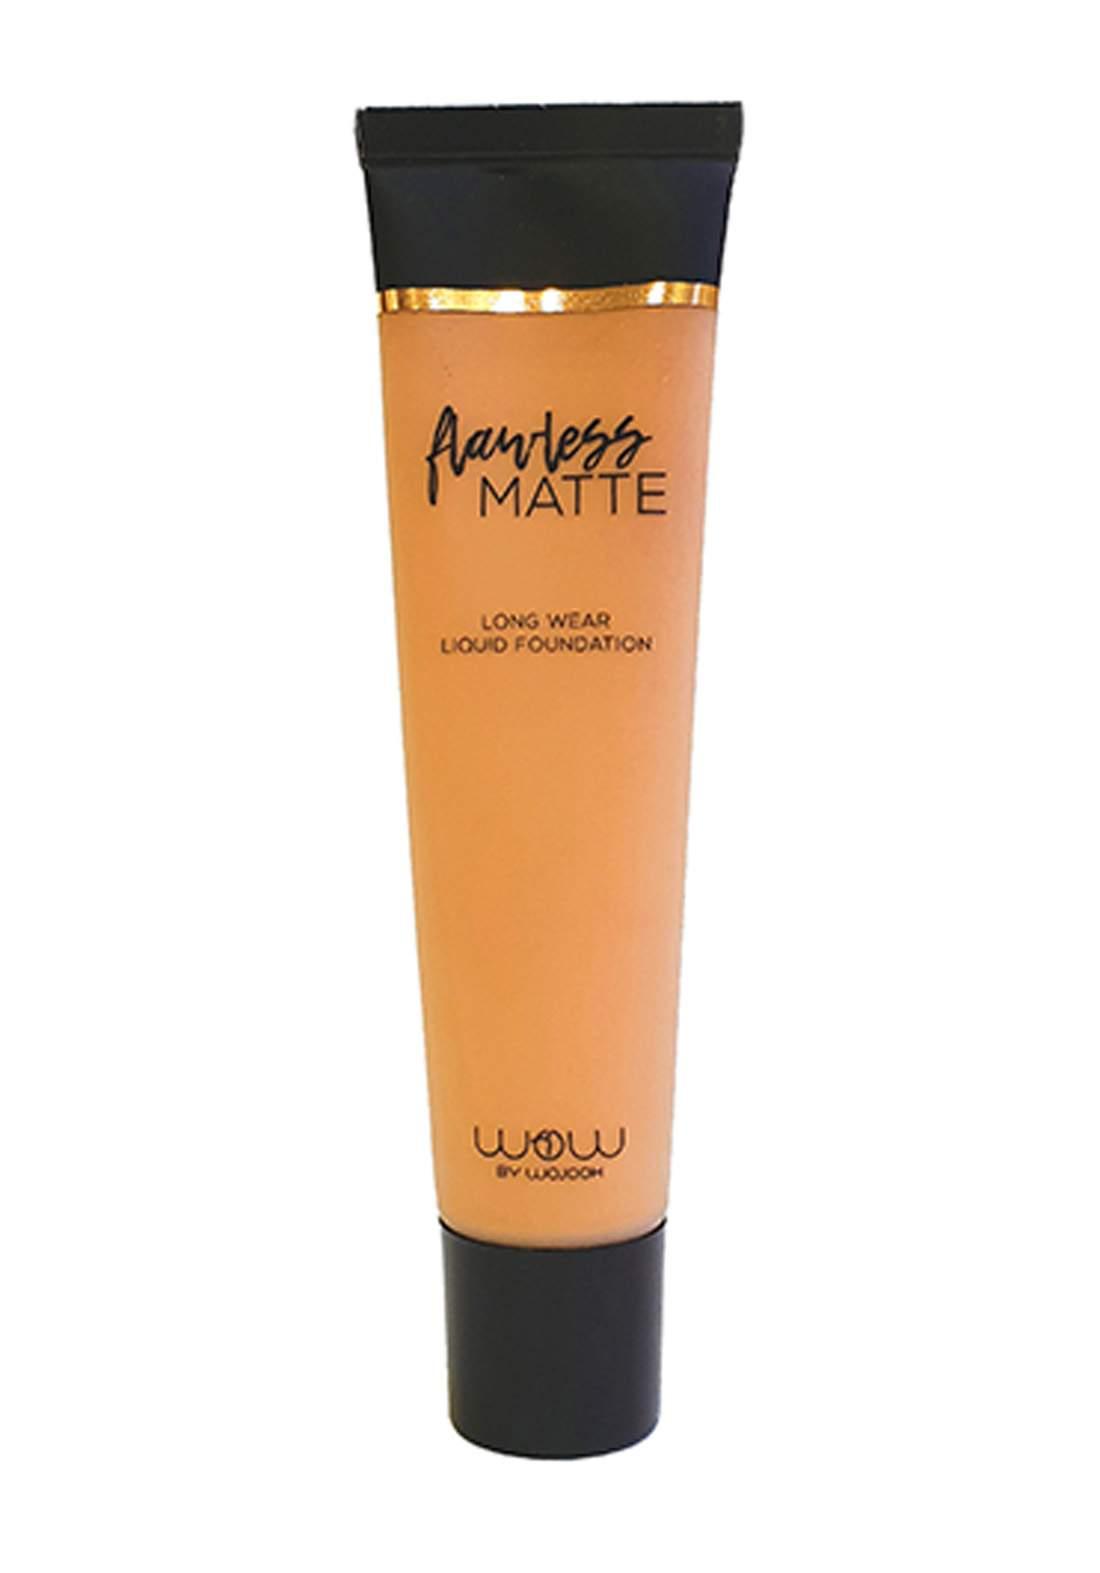 Wow Beauty Forward 2319 Flawless Matte Liquid Foundation No.Y120 Classic Caramel 30ml كريم اساس